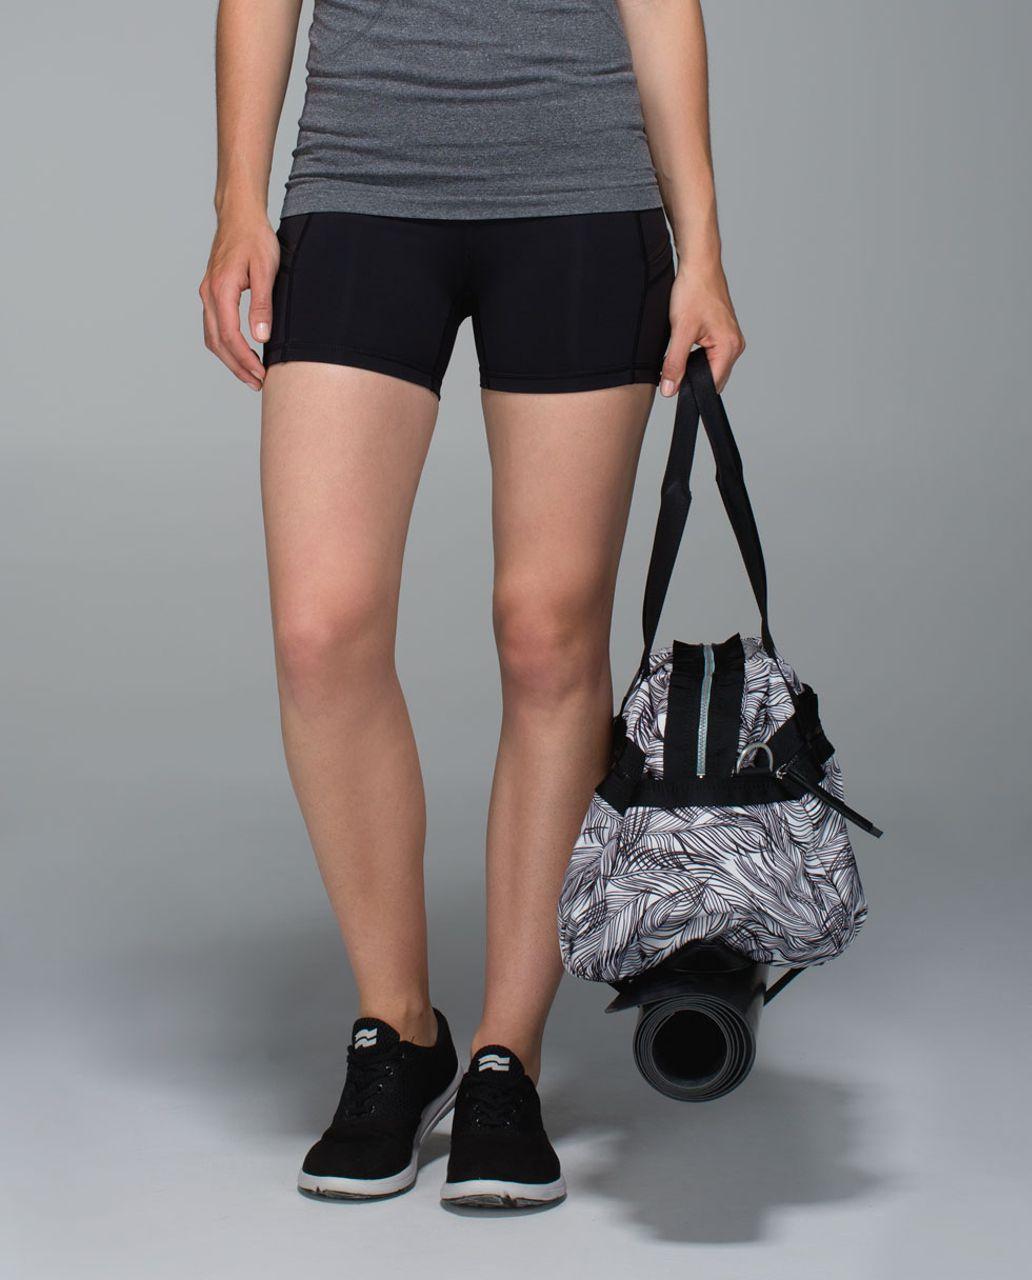 Lululemon Gym To Win Duffel - Sketchy Palms White Black / Black